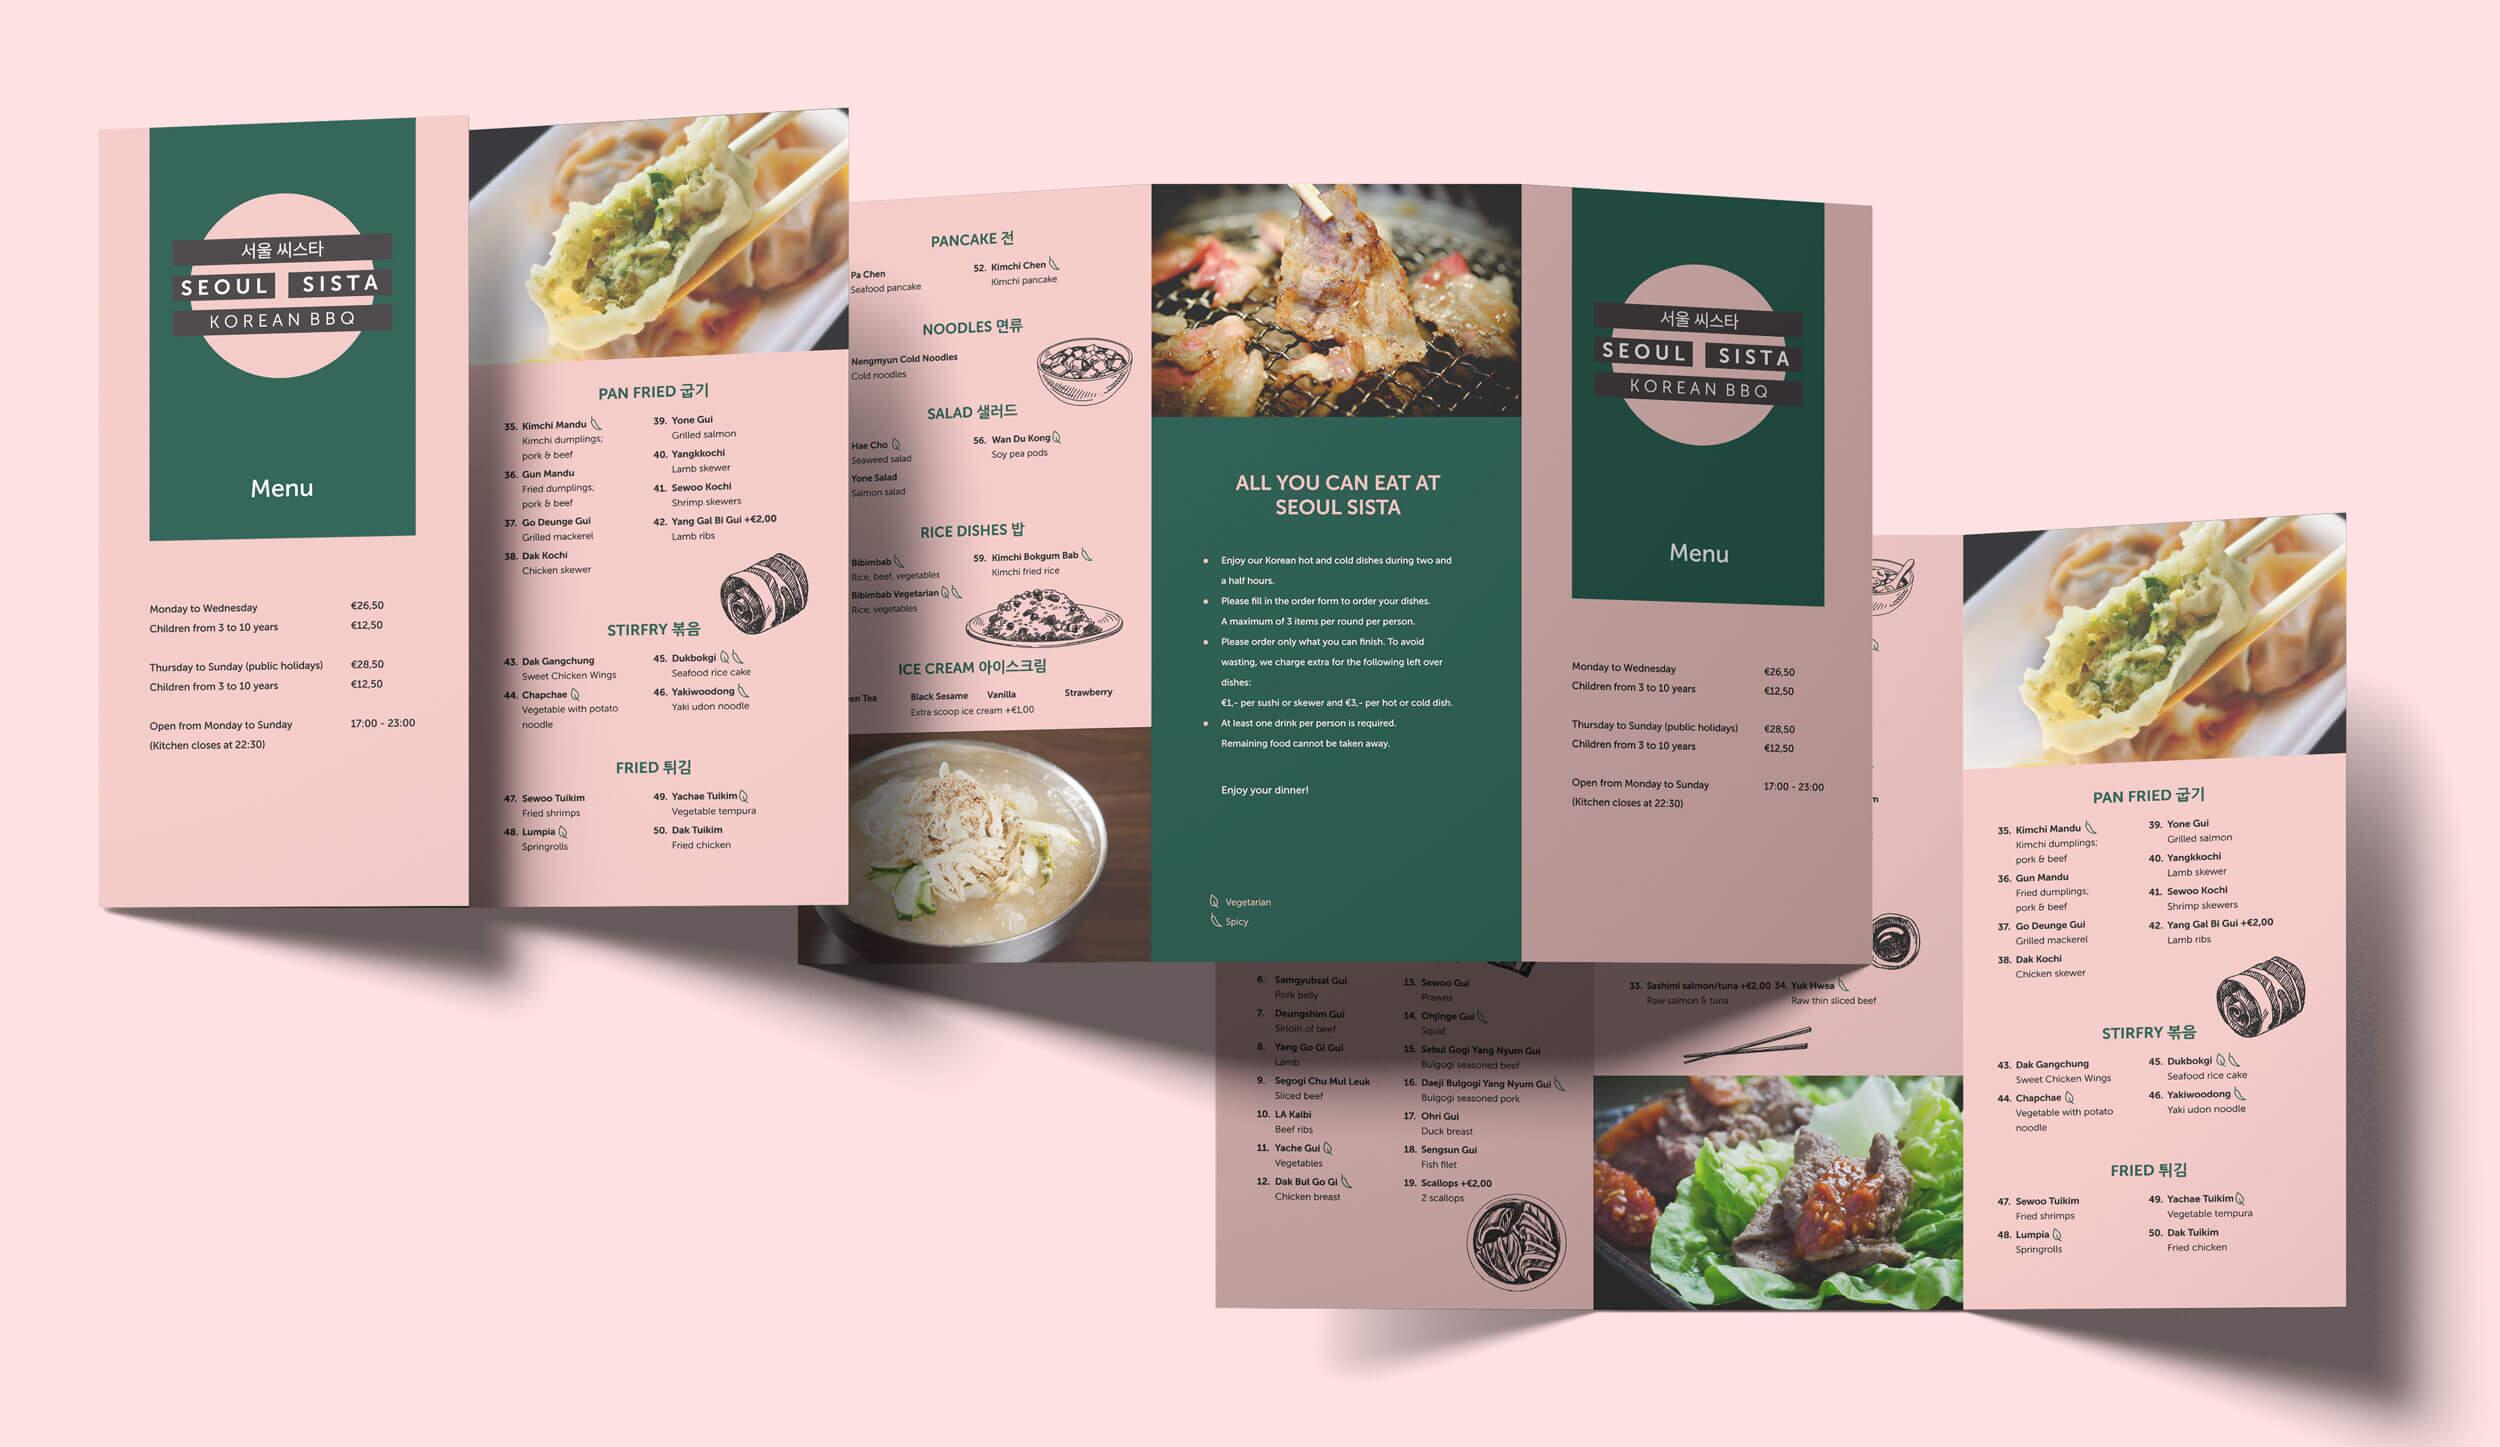 Mixus studio, Seoul Sista menu